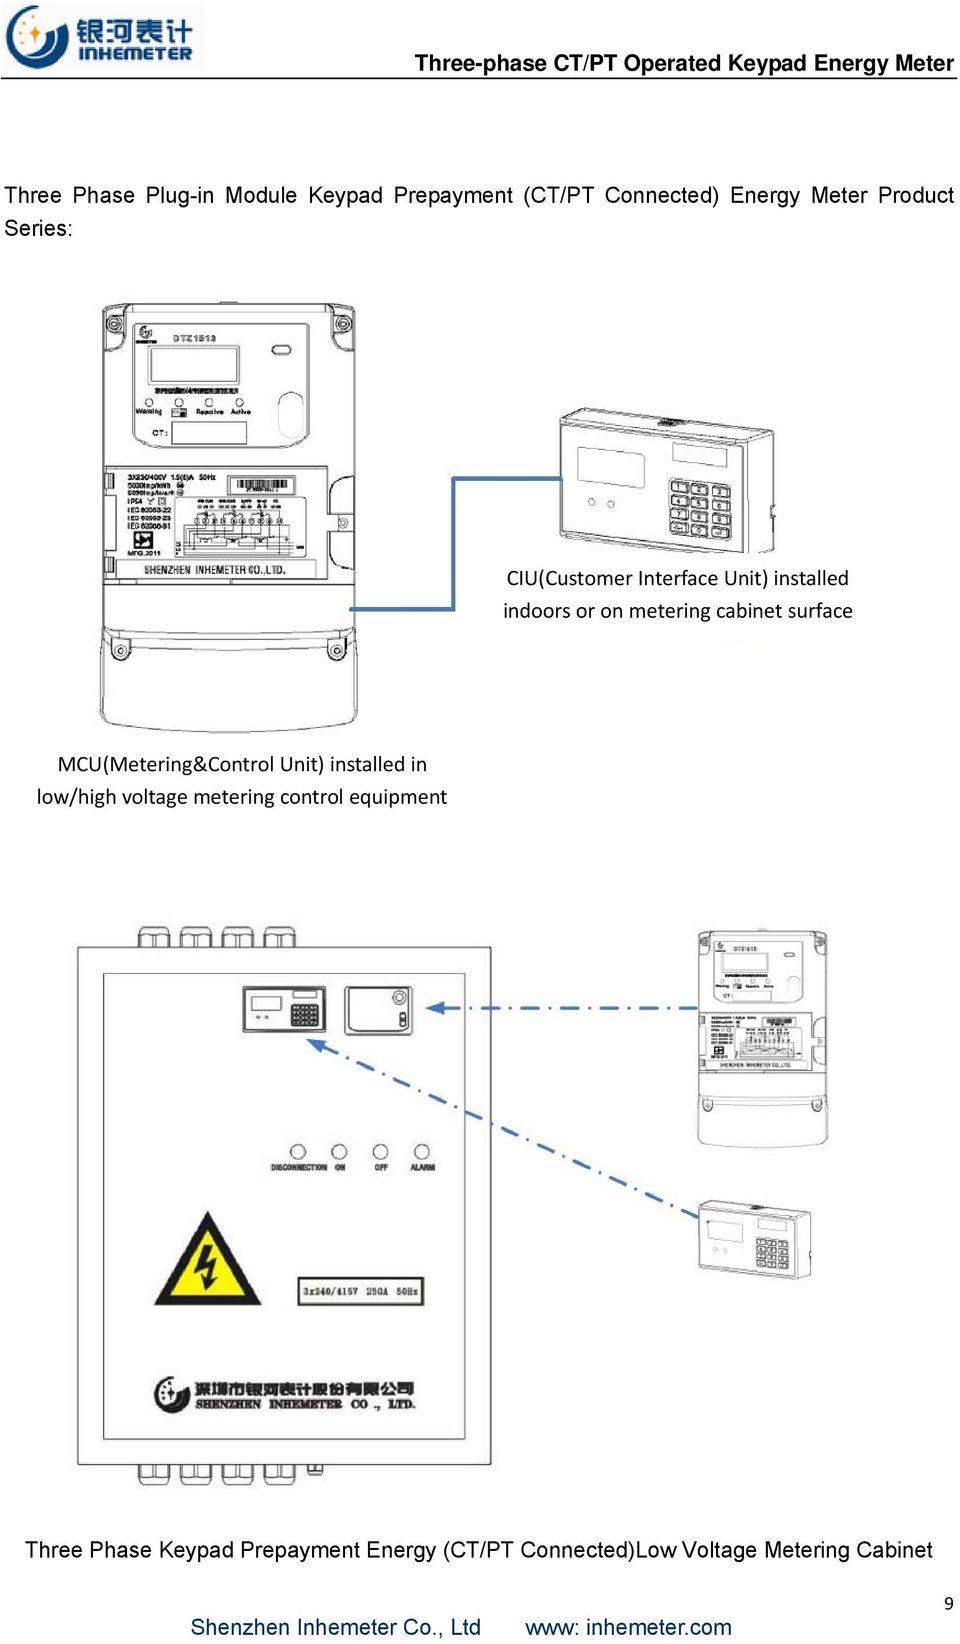 medium resolution of surface mcu metering control unit installed in low high voltage metering control